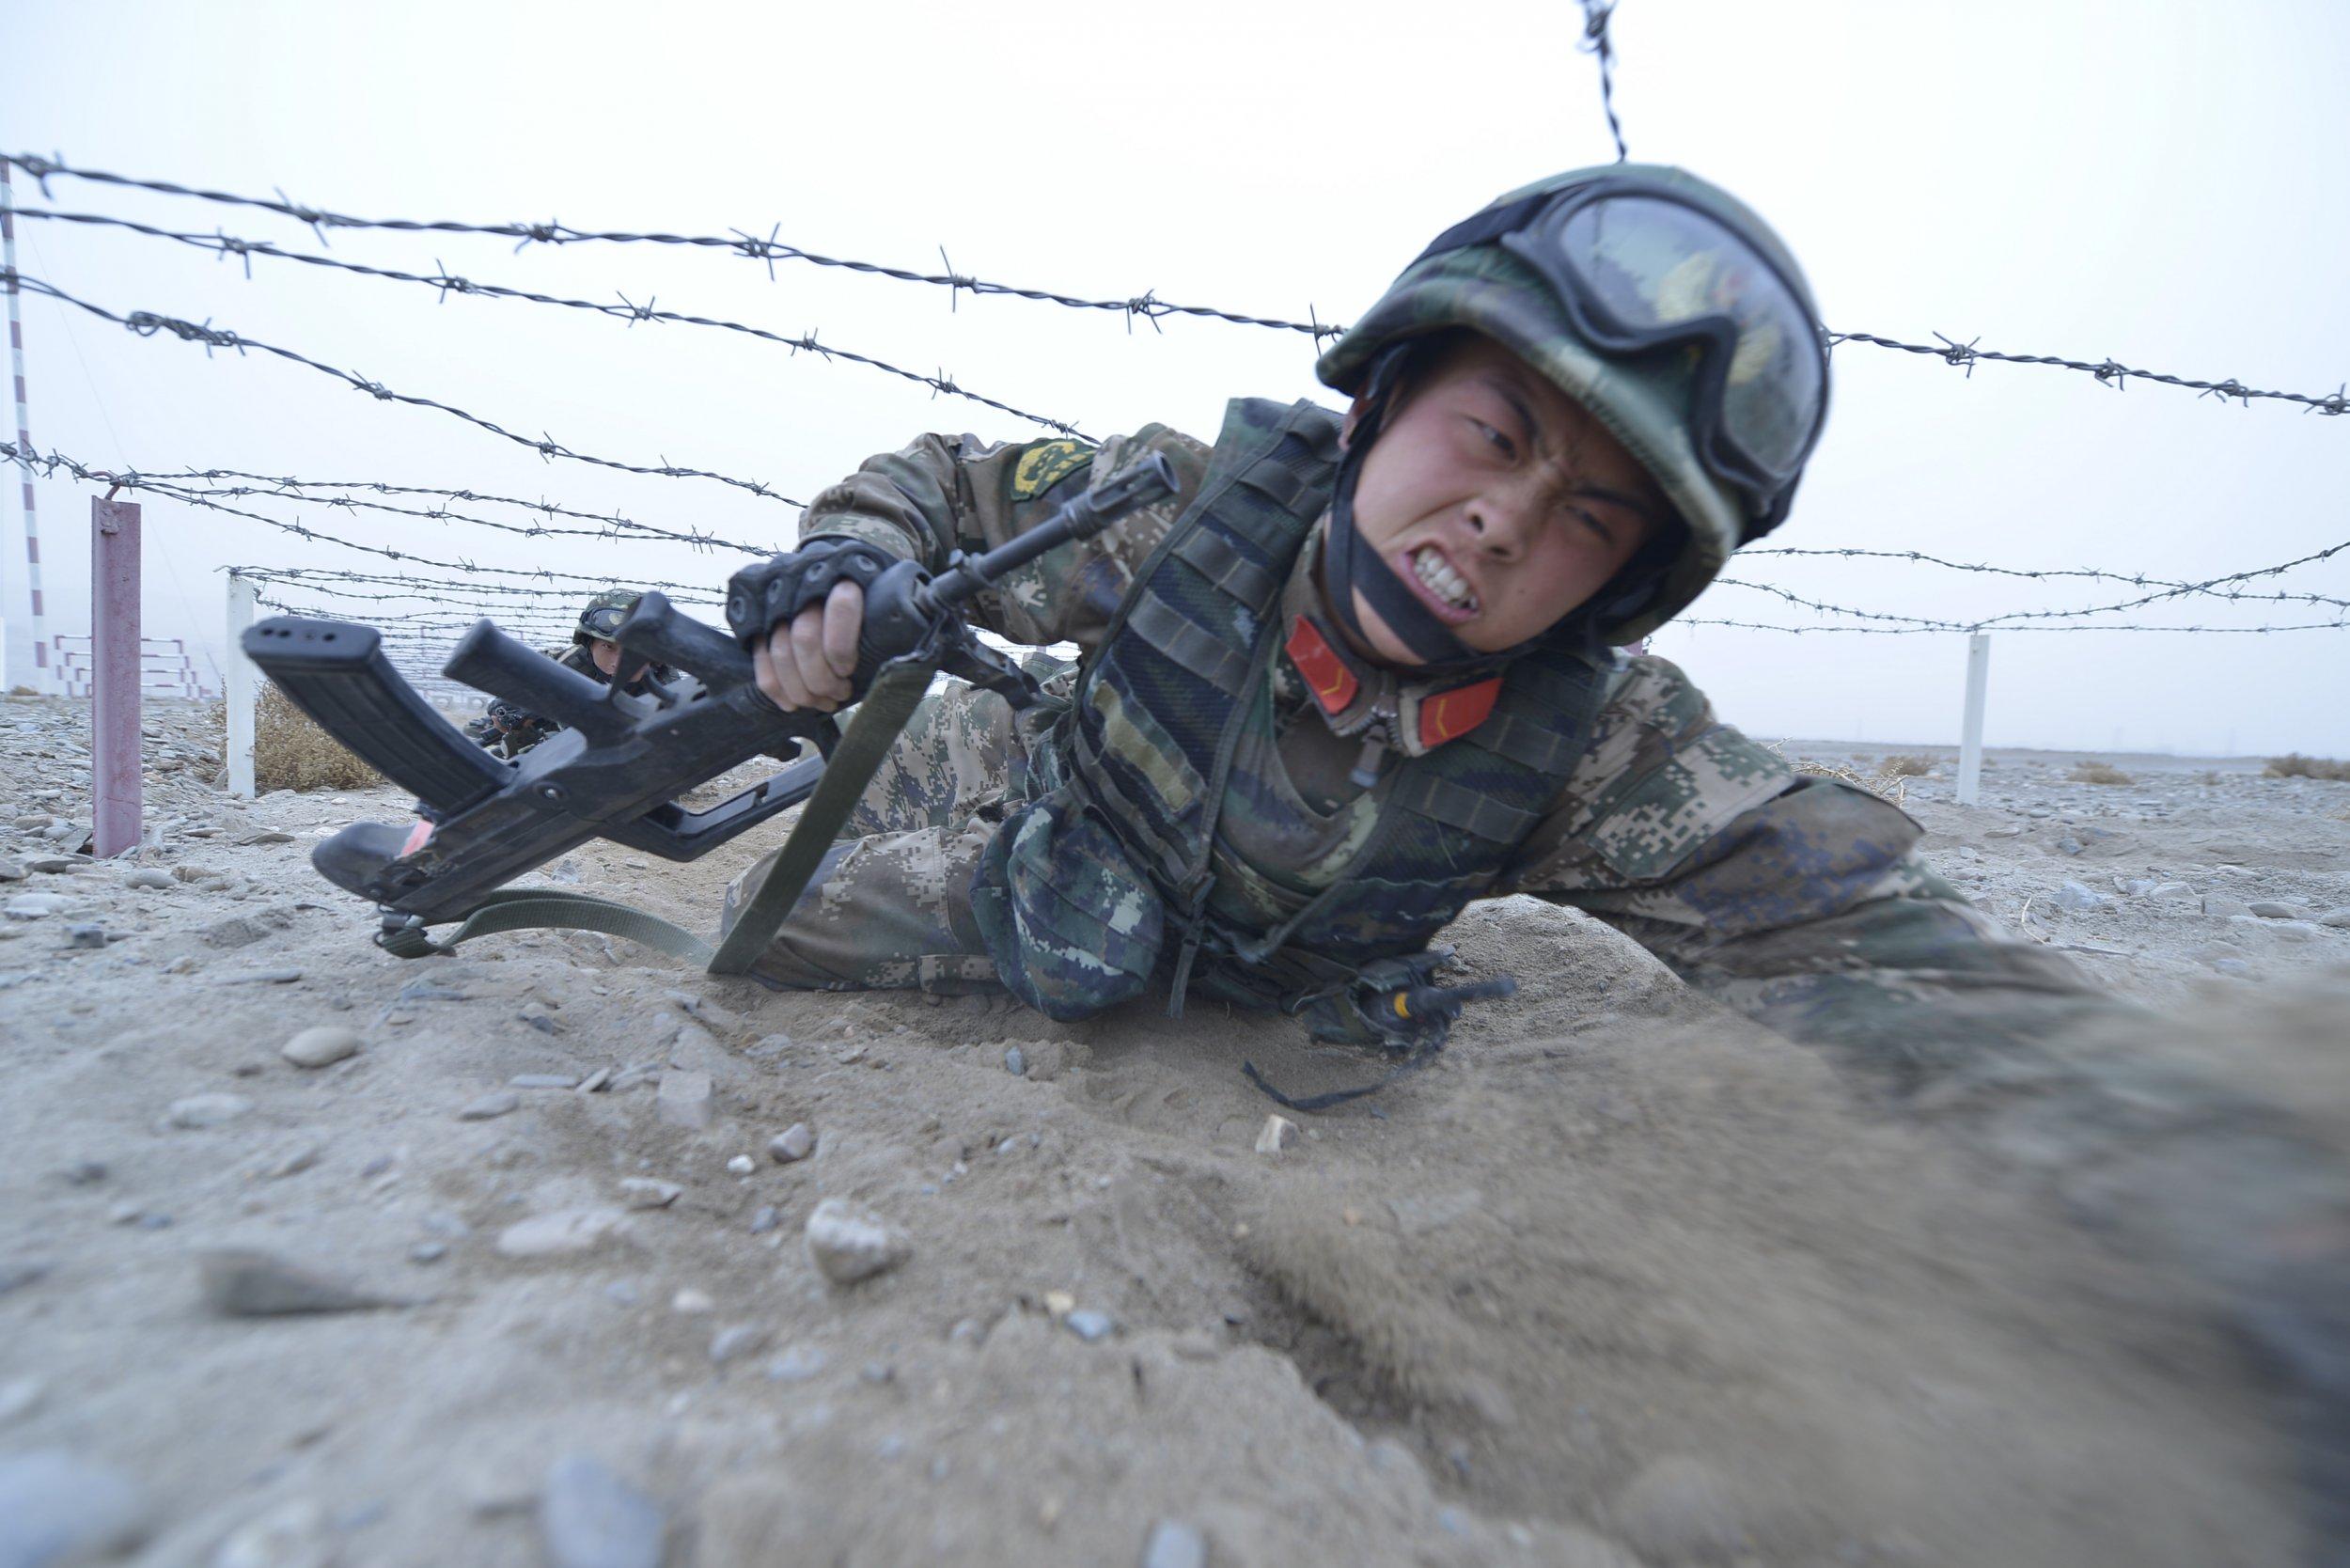 Chinese soldier crawls under barbed wire